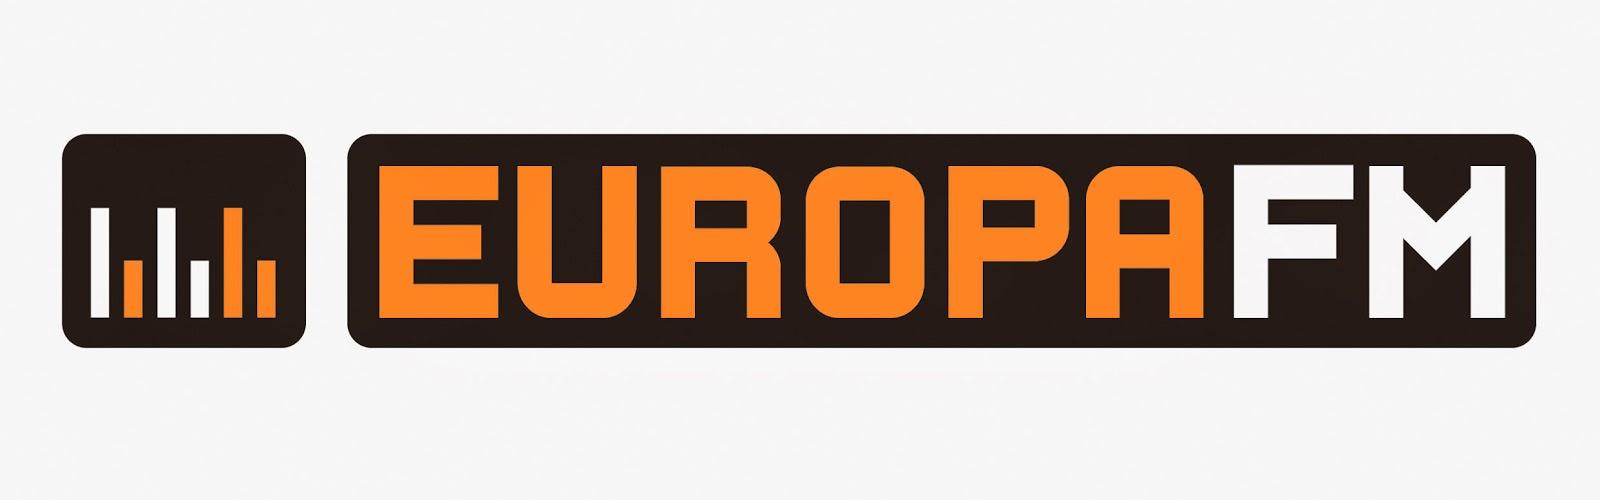 Onda Cero / Europa FM / Melodía FM: El Grupo Atresmedia ya ha ...